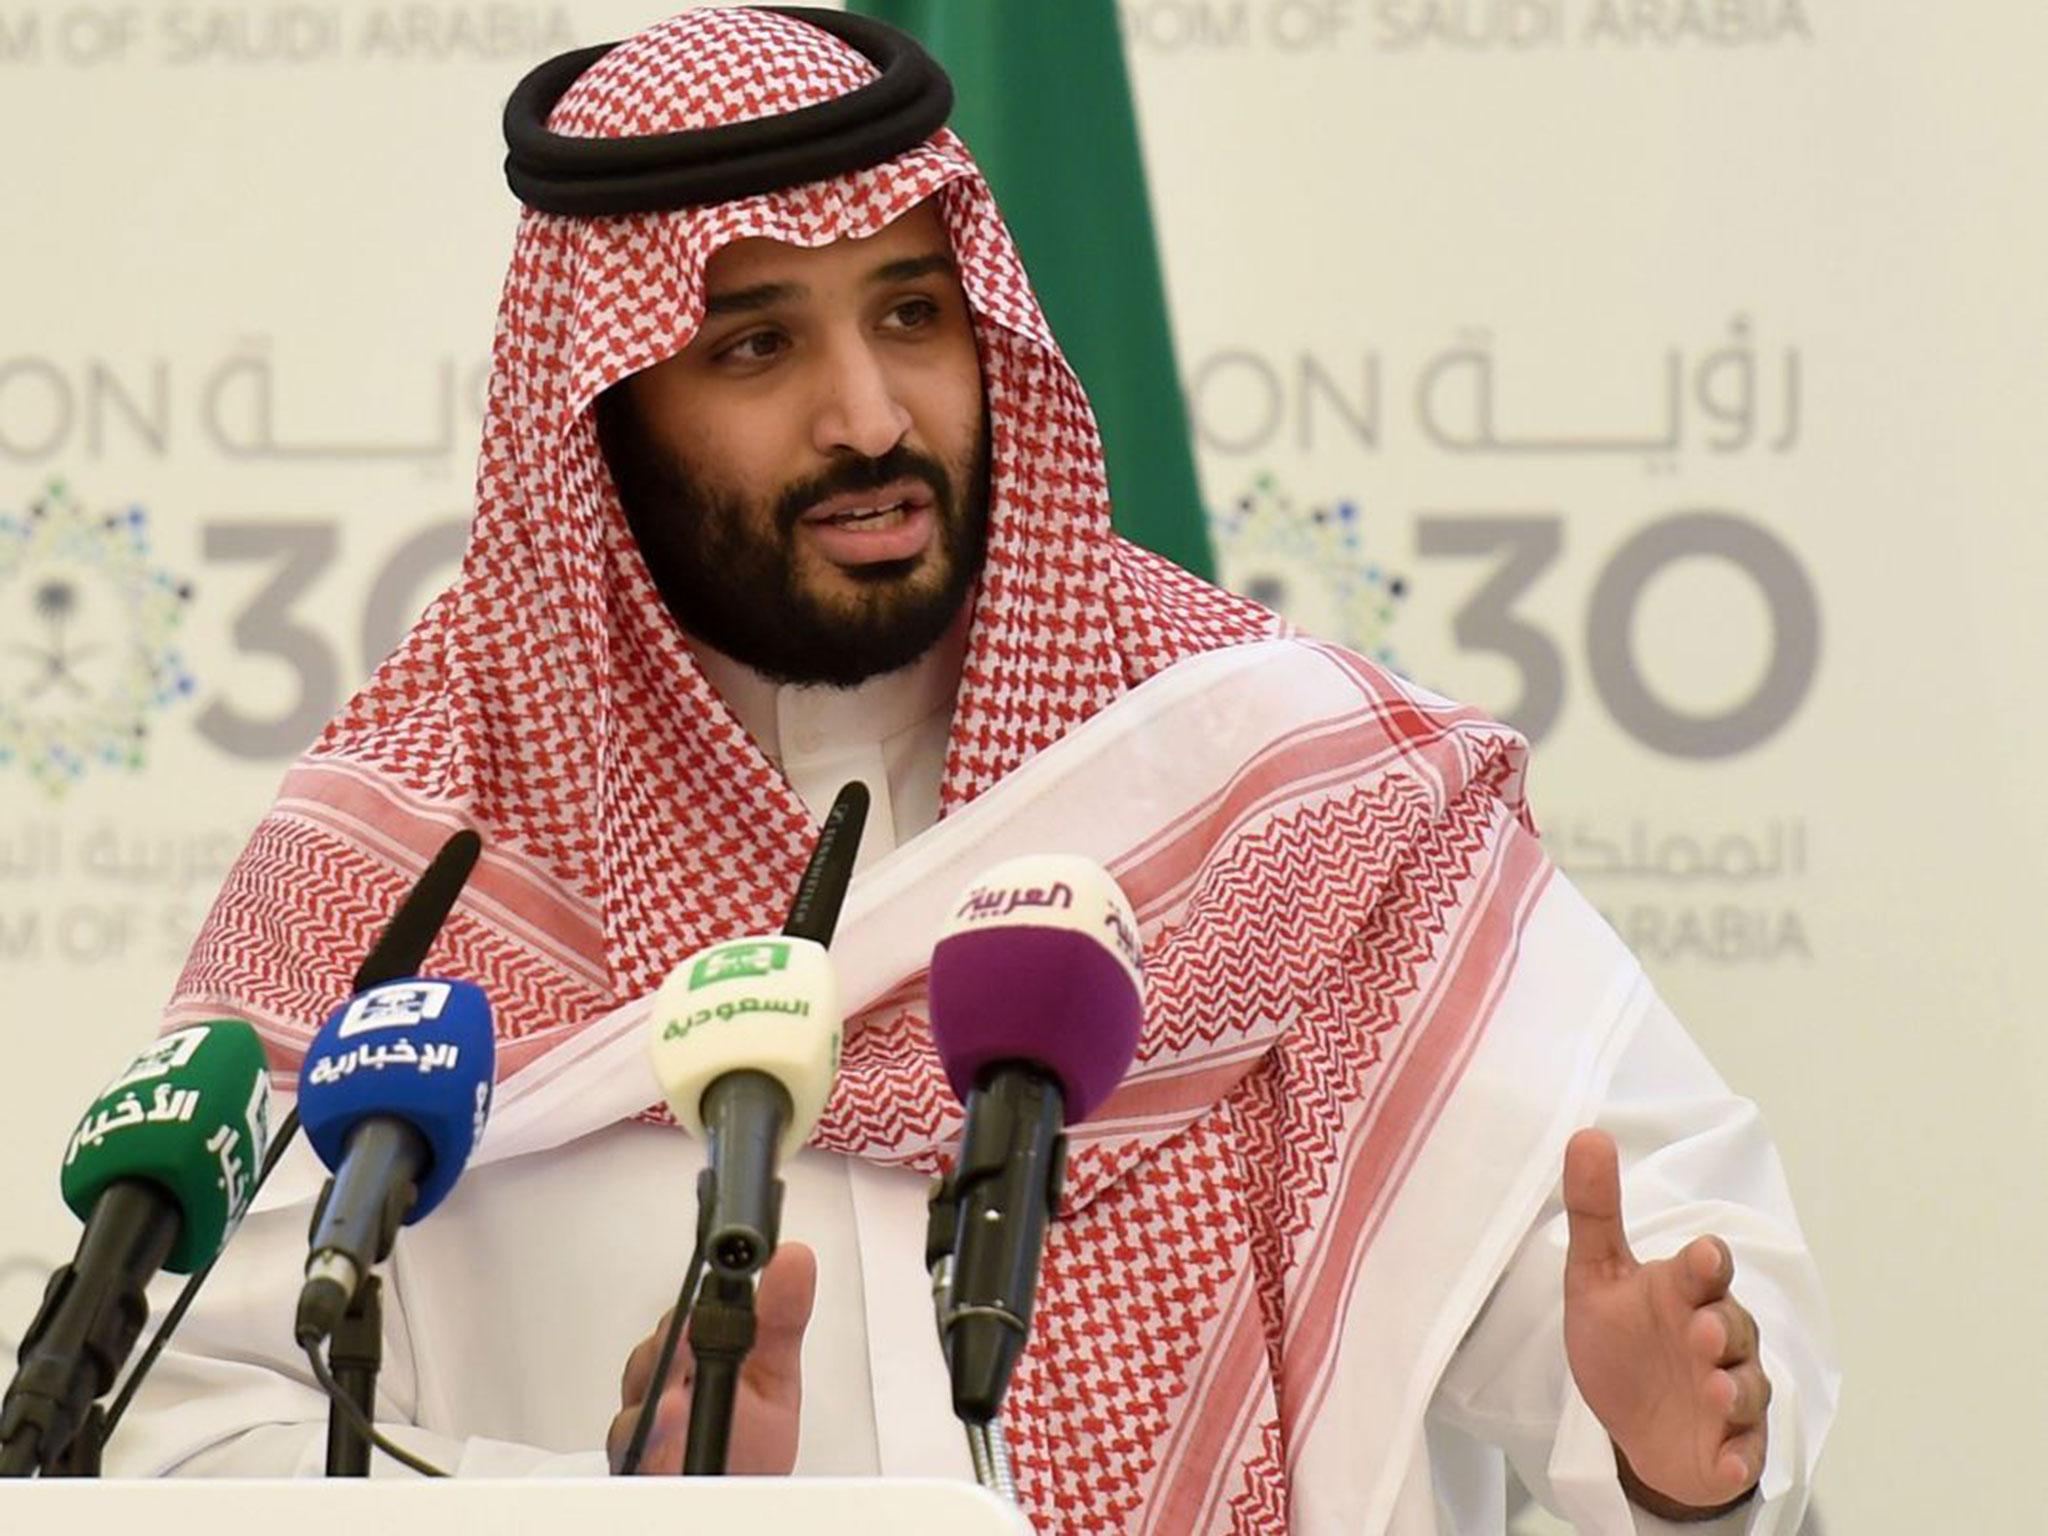 Photo: Crown Prince bin Salman at Saudi Vision 2030  Photo Courtesy: AP/Getty